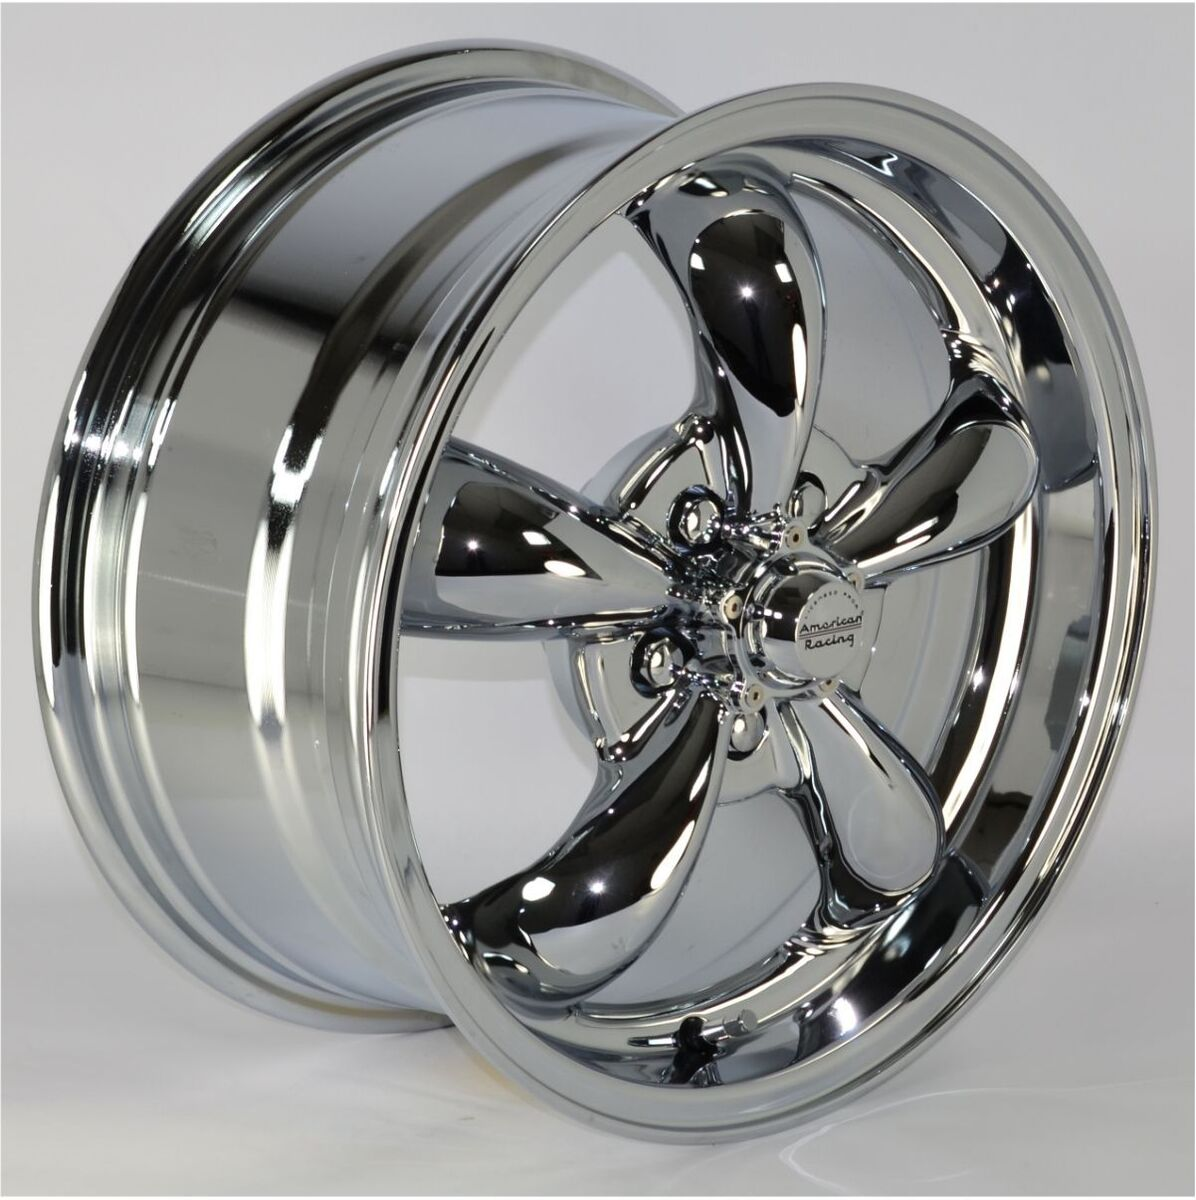 "16x7"" Chrome 5 Spoke Wheels Rims 5x115 mm Lug Pattern for Chevy Monte Carlo 2001"